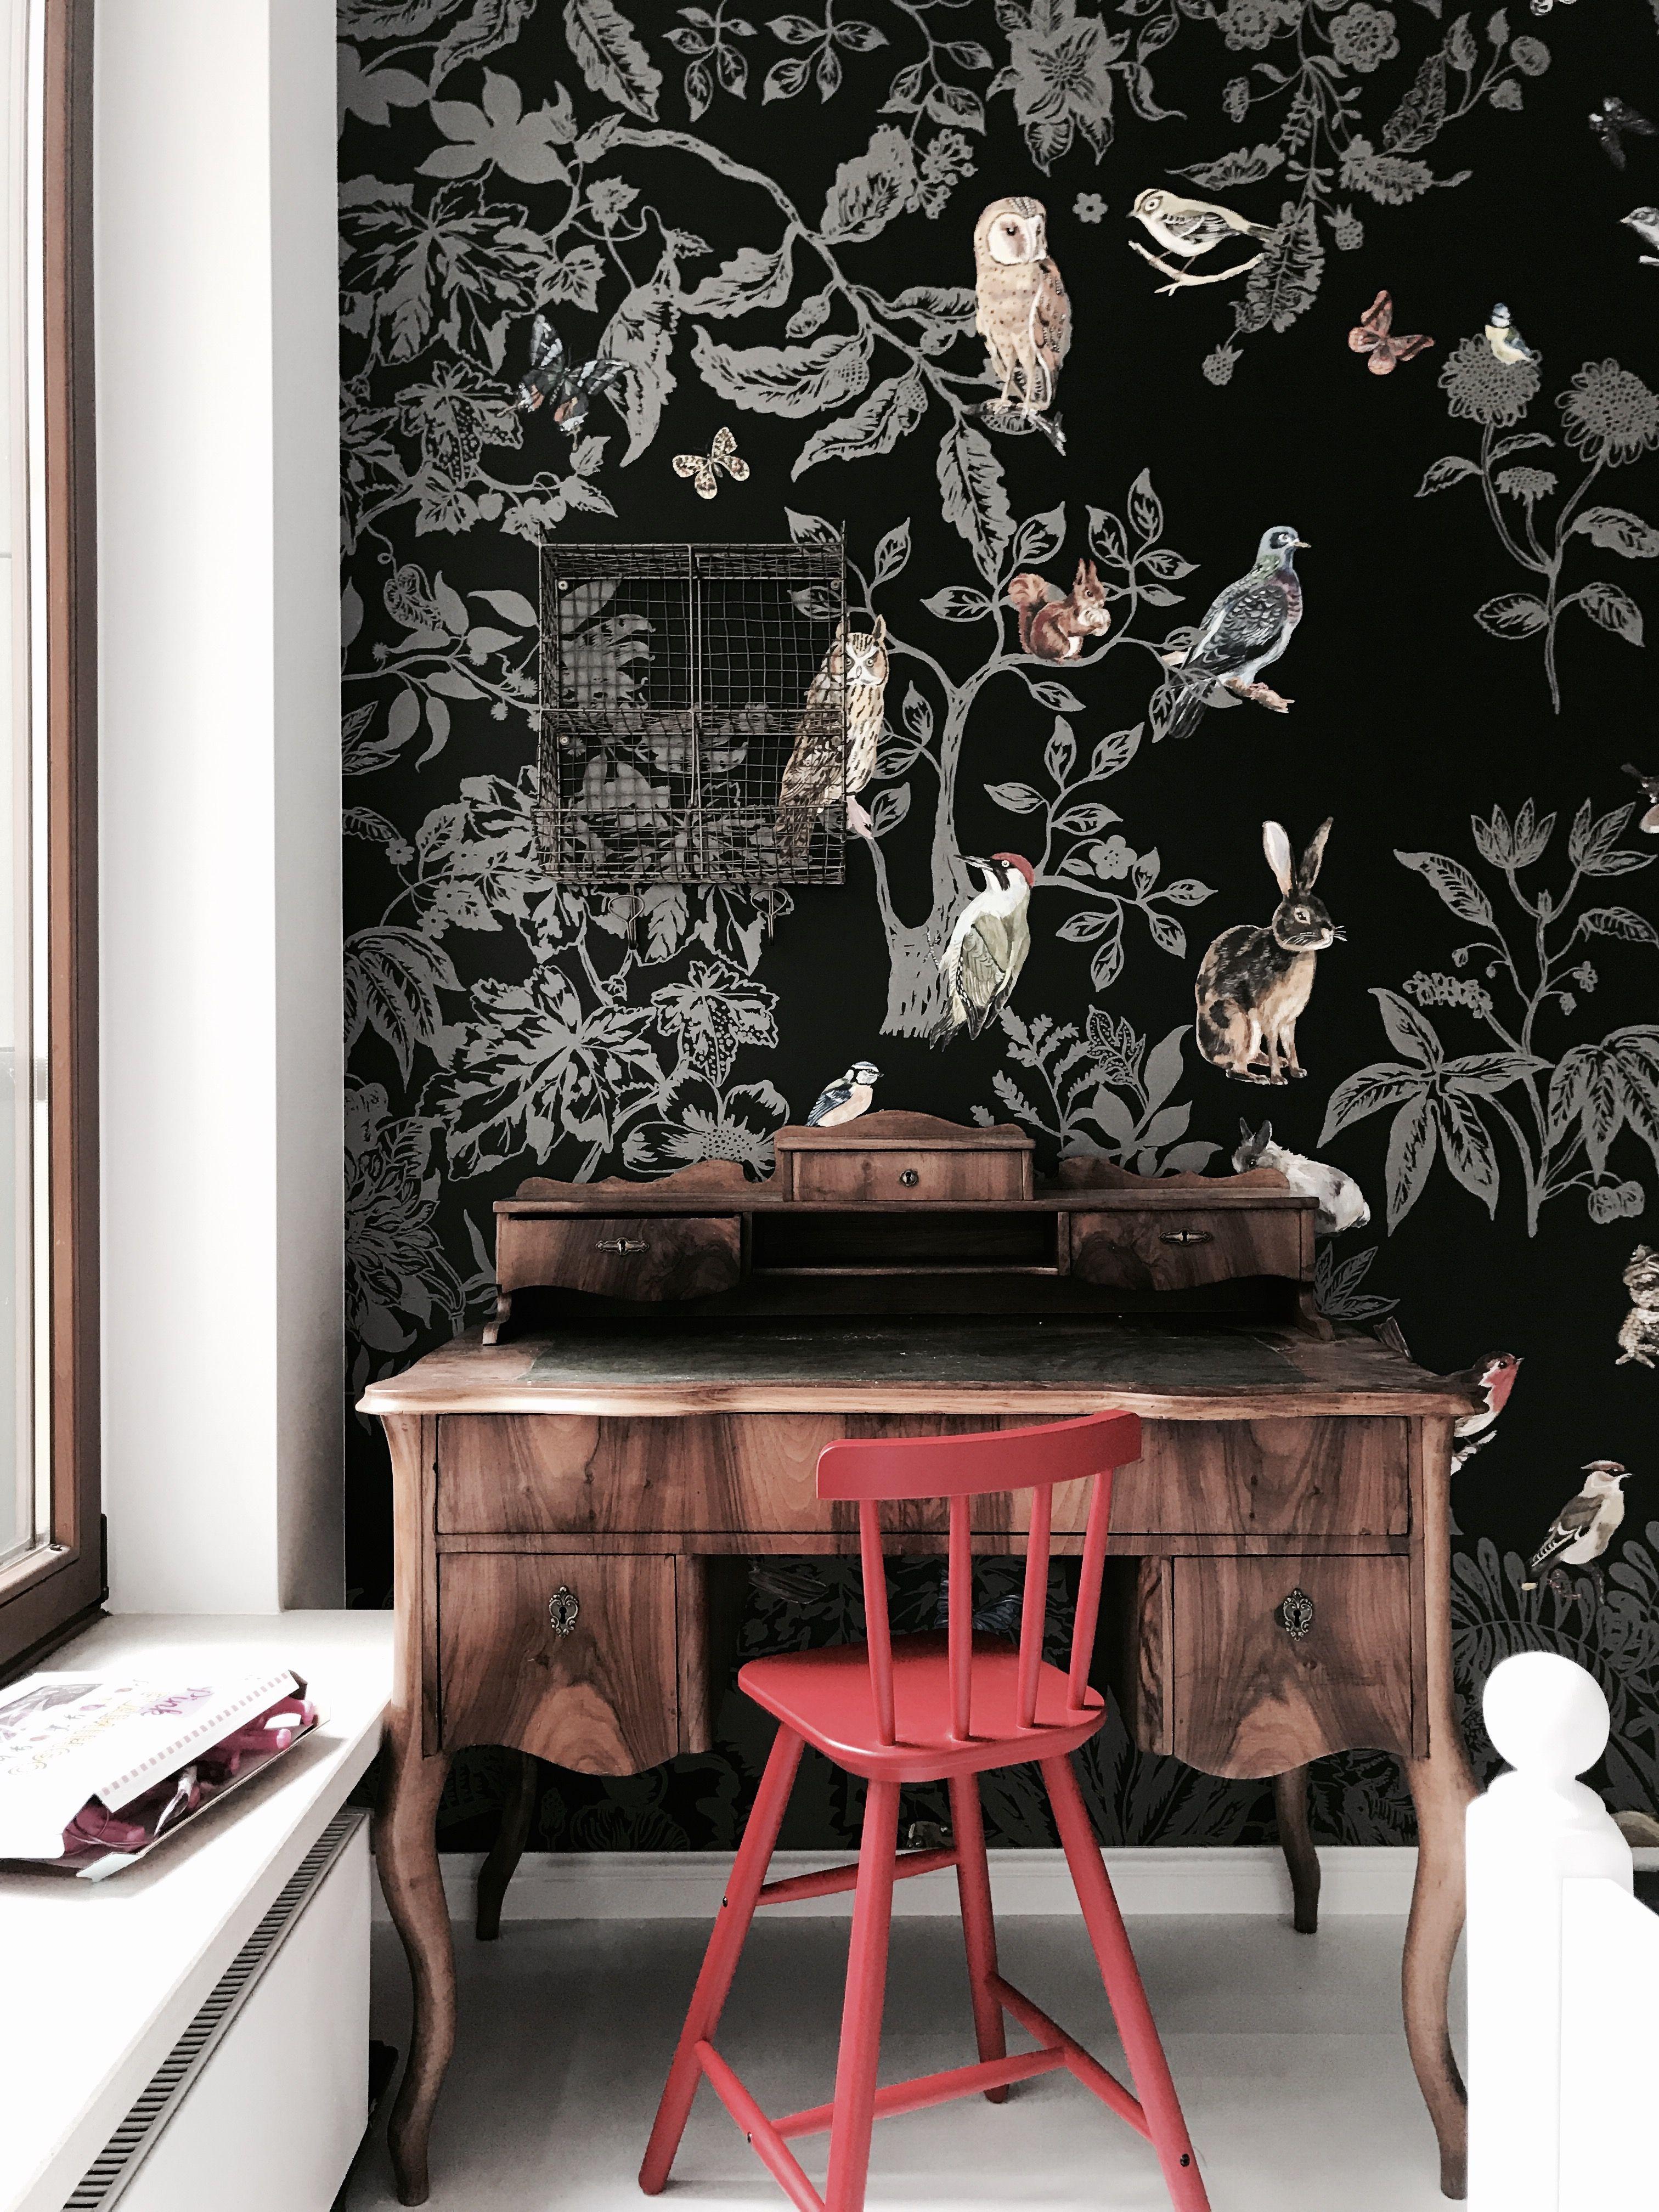 Nathalie Lete Wallpaper Foret Noire Domestic Cool Wallpaper Lovely Things Murals Kids Room